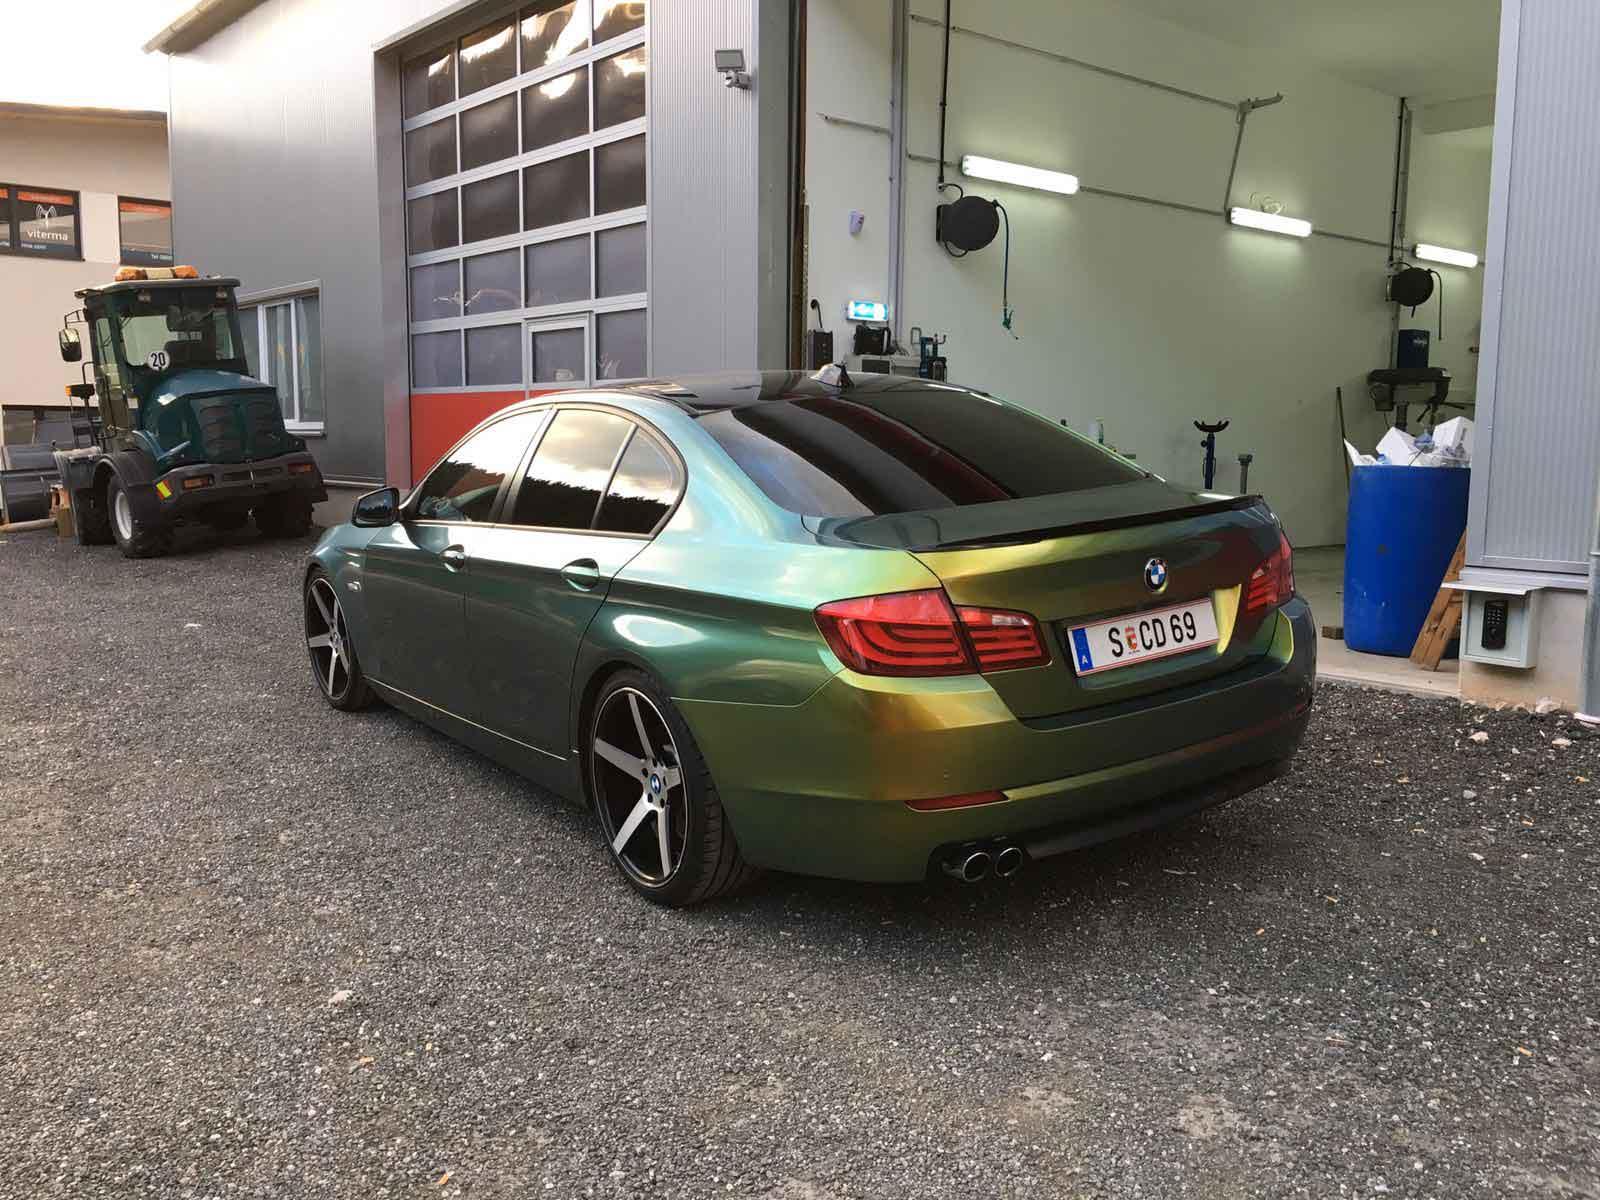 Spezialfolie Fahrzeugfolierung Salzburg,Fahrzeugfolierung Pongau,Lungau, Tamsweg, Salzburg Stadt